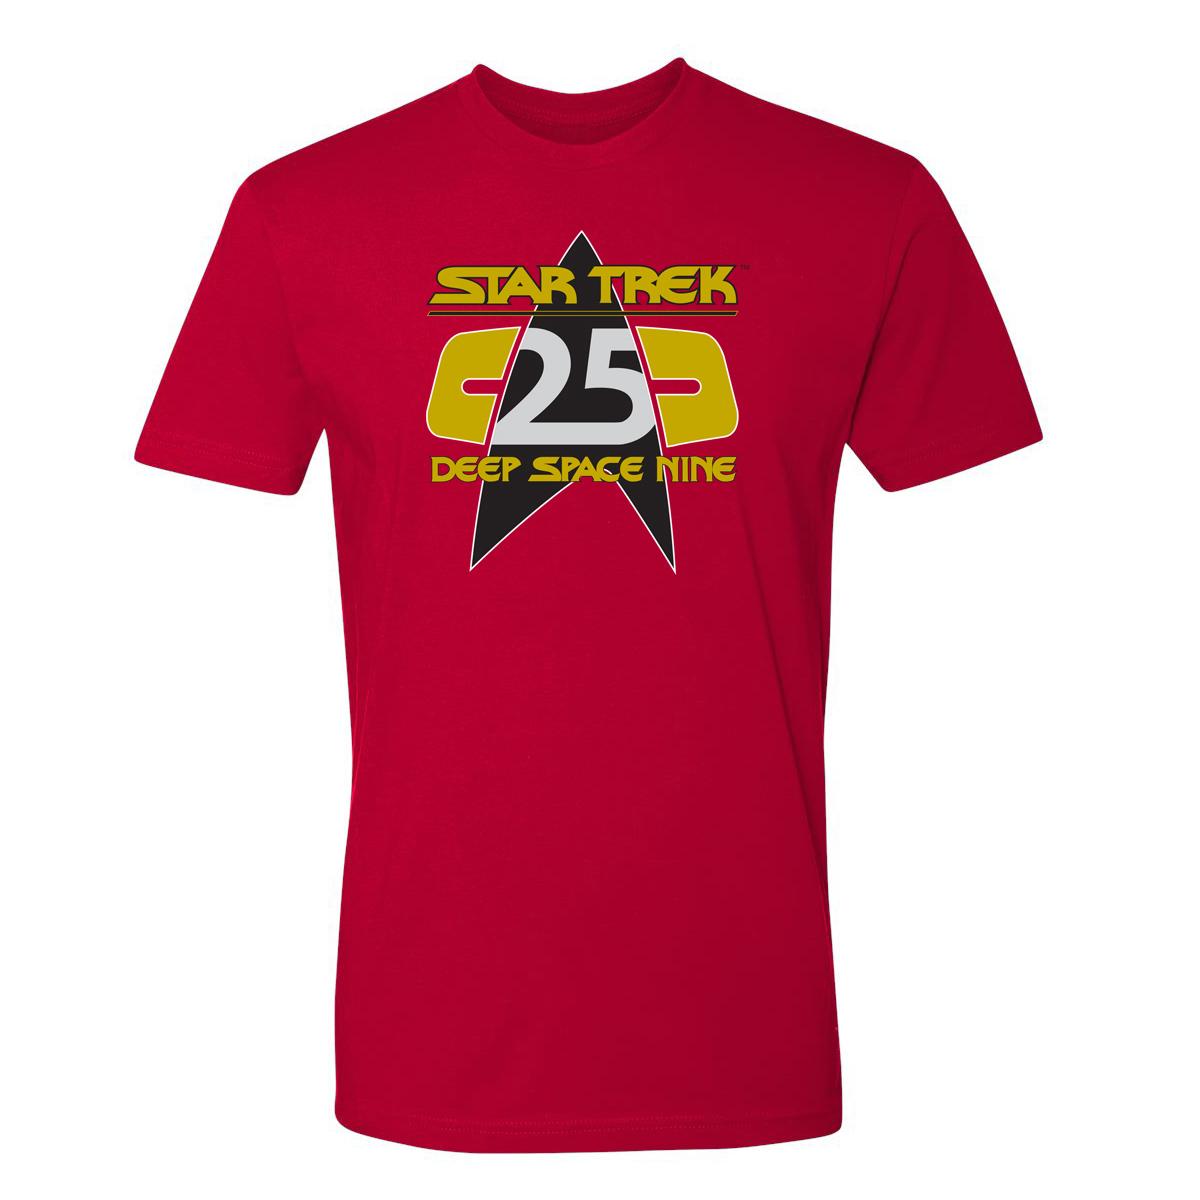 Star Trek Deep Space Nine 25th Anniversary T-Shirt